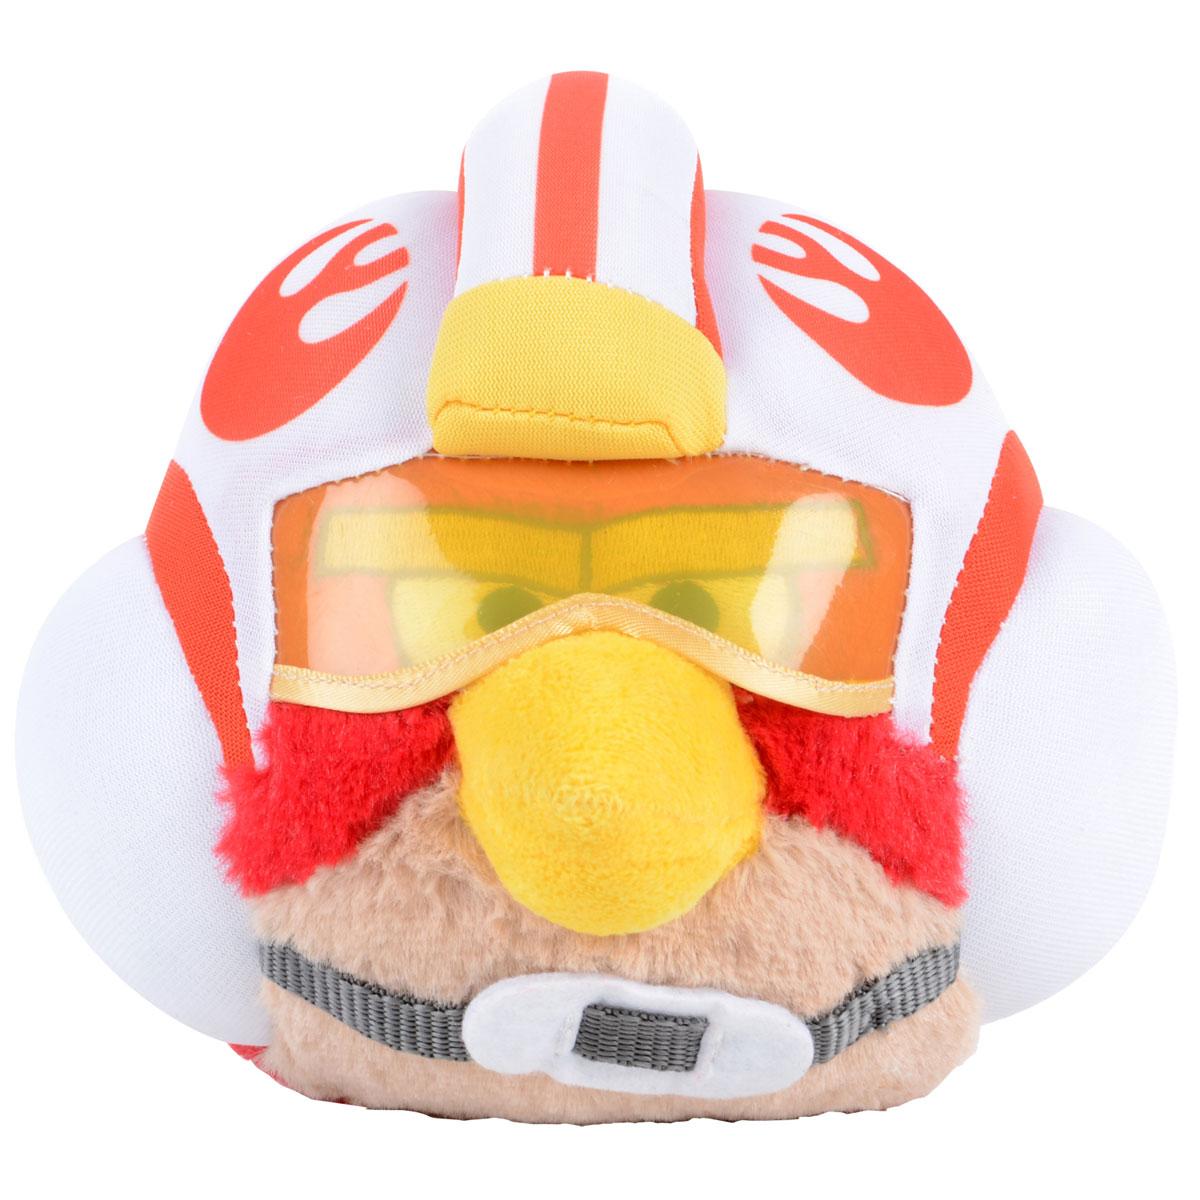 "Angry Birds Мягкая озвученная игрушка ""Star Wars: Luke Skywalker Pilot"", 27 см"